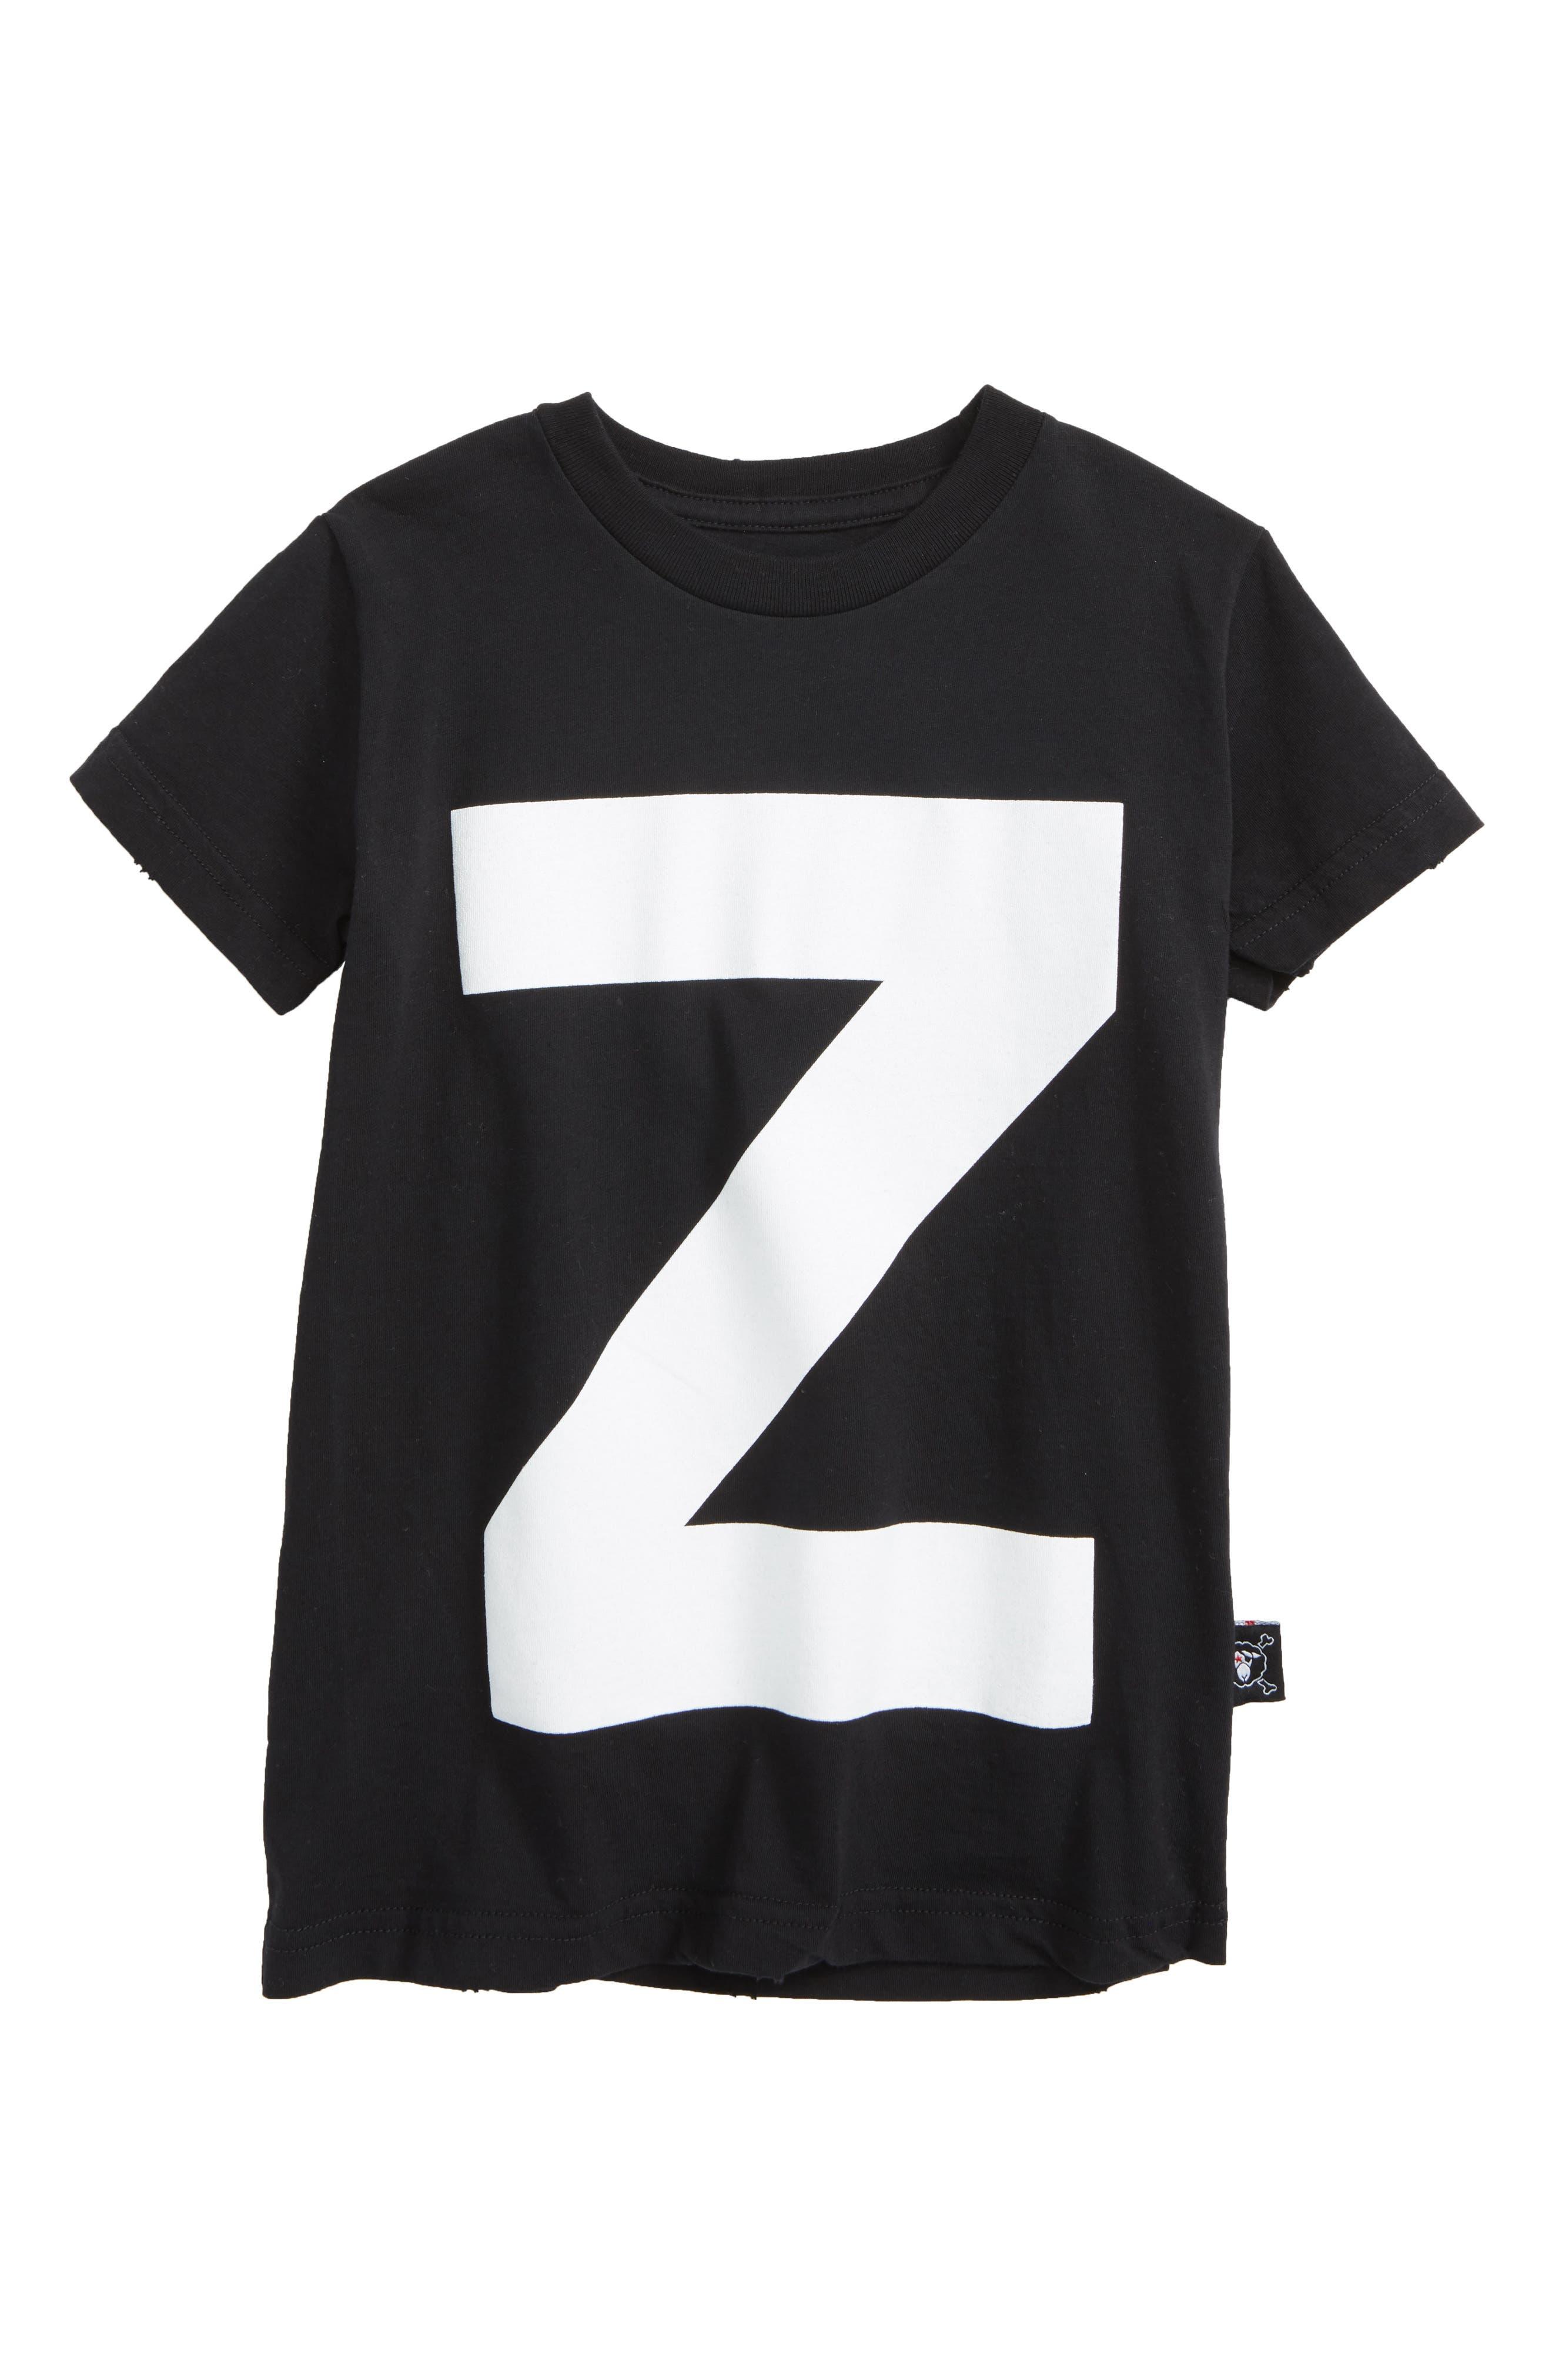 Z Graphic T-Shirt,                             Main thumbnail 1, color,                             001